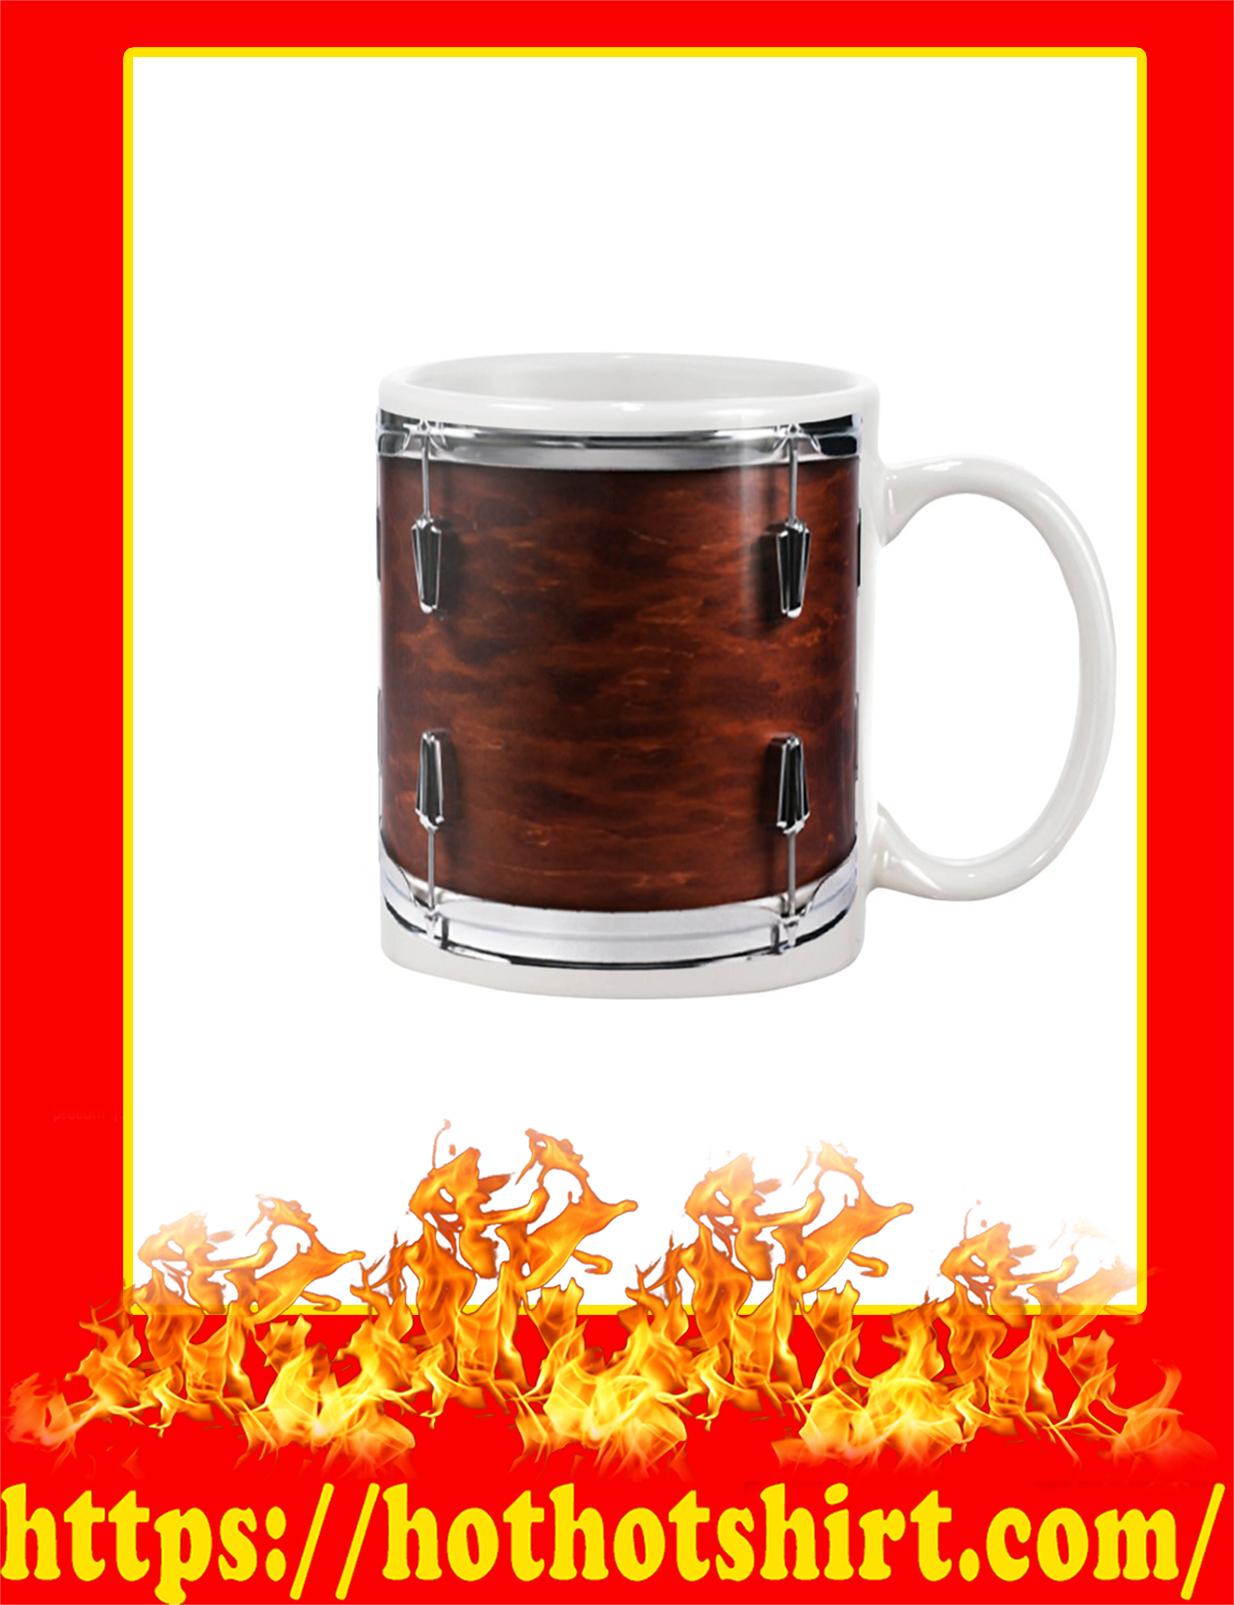 Drummer Drums Mug - White